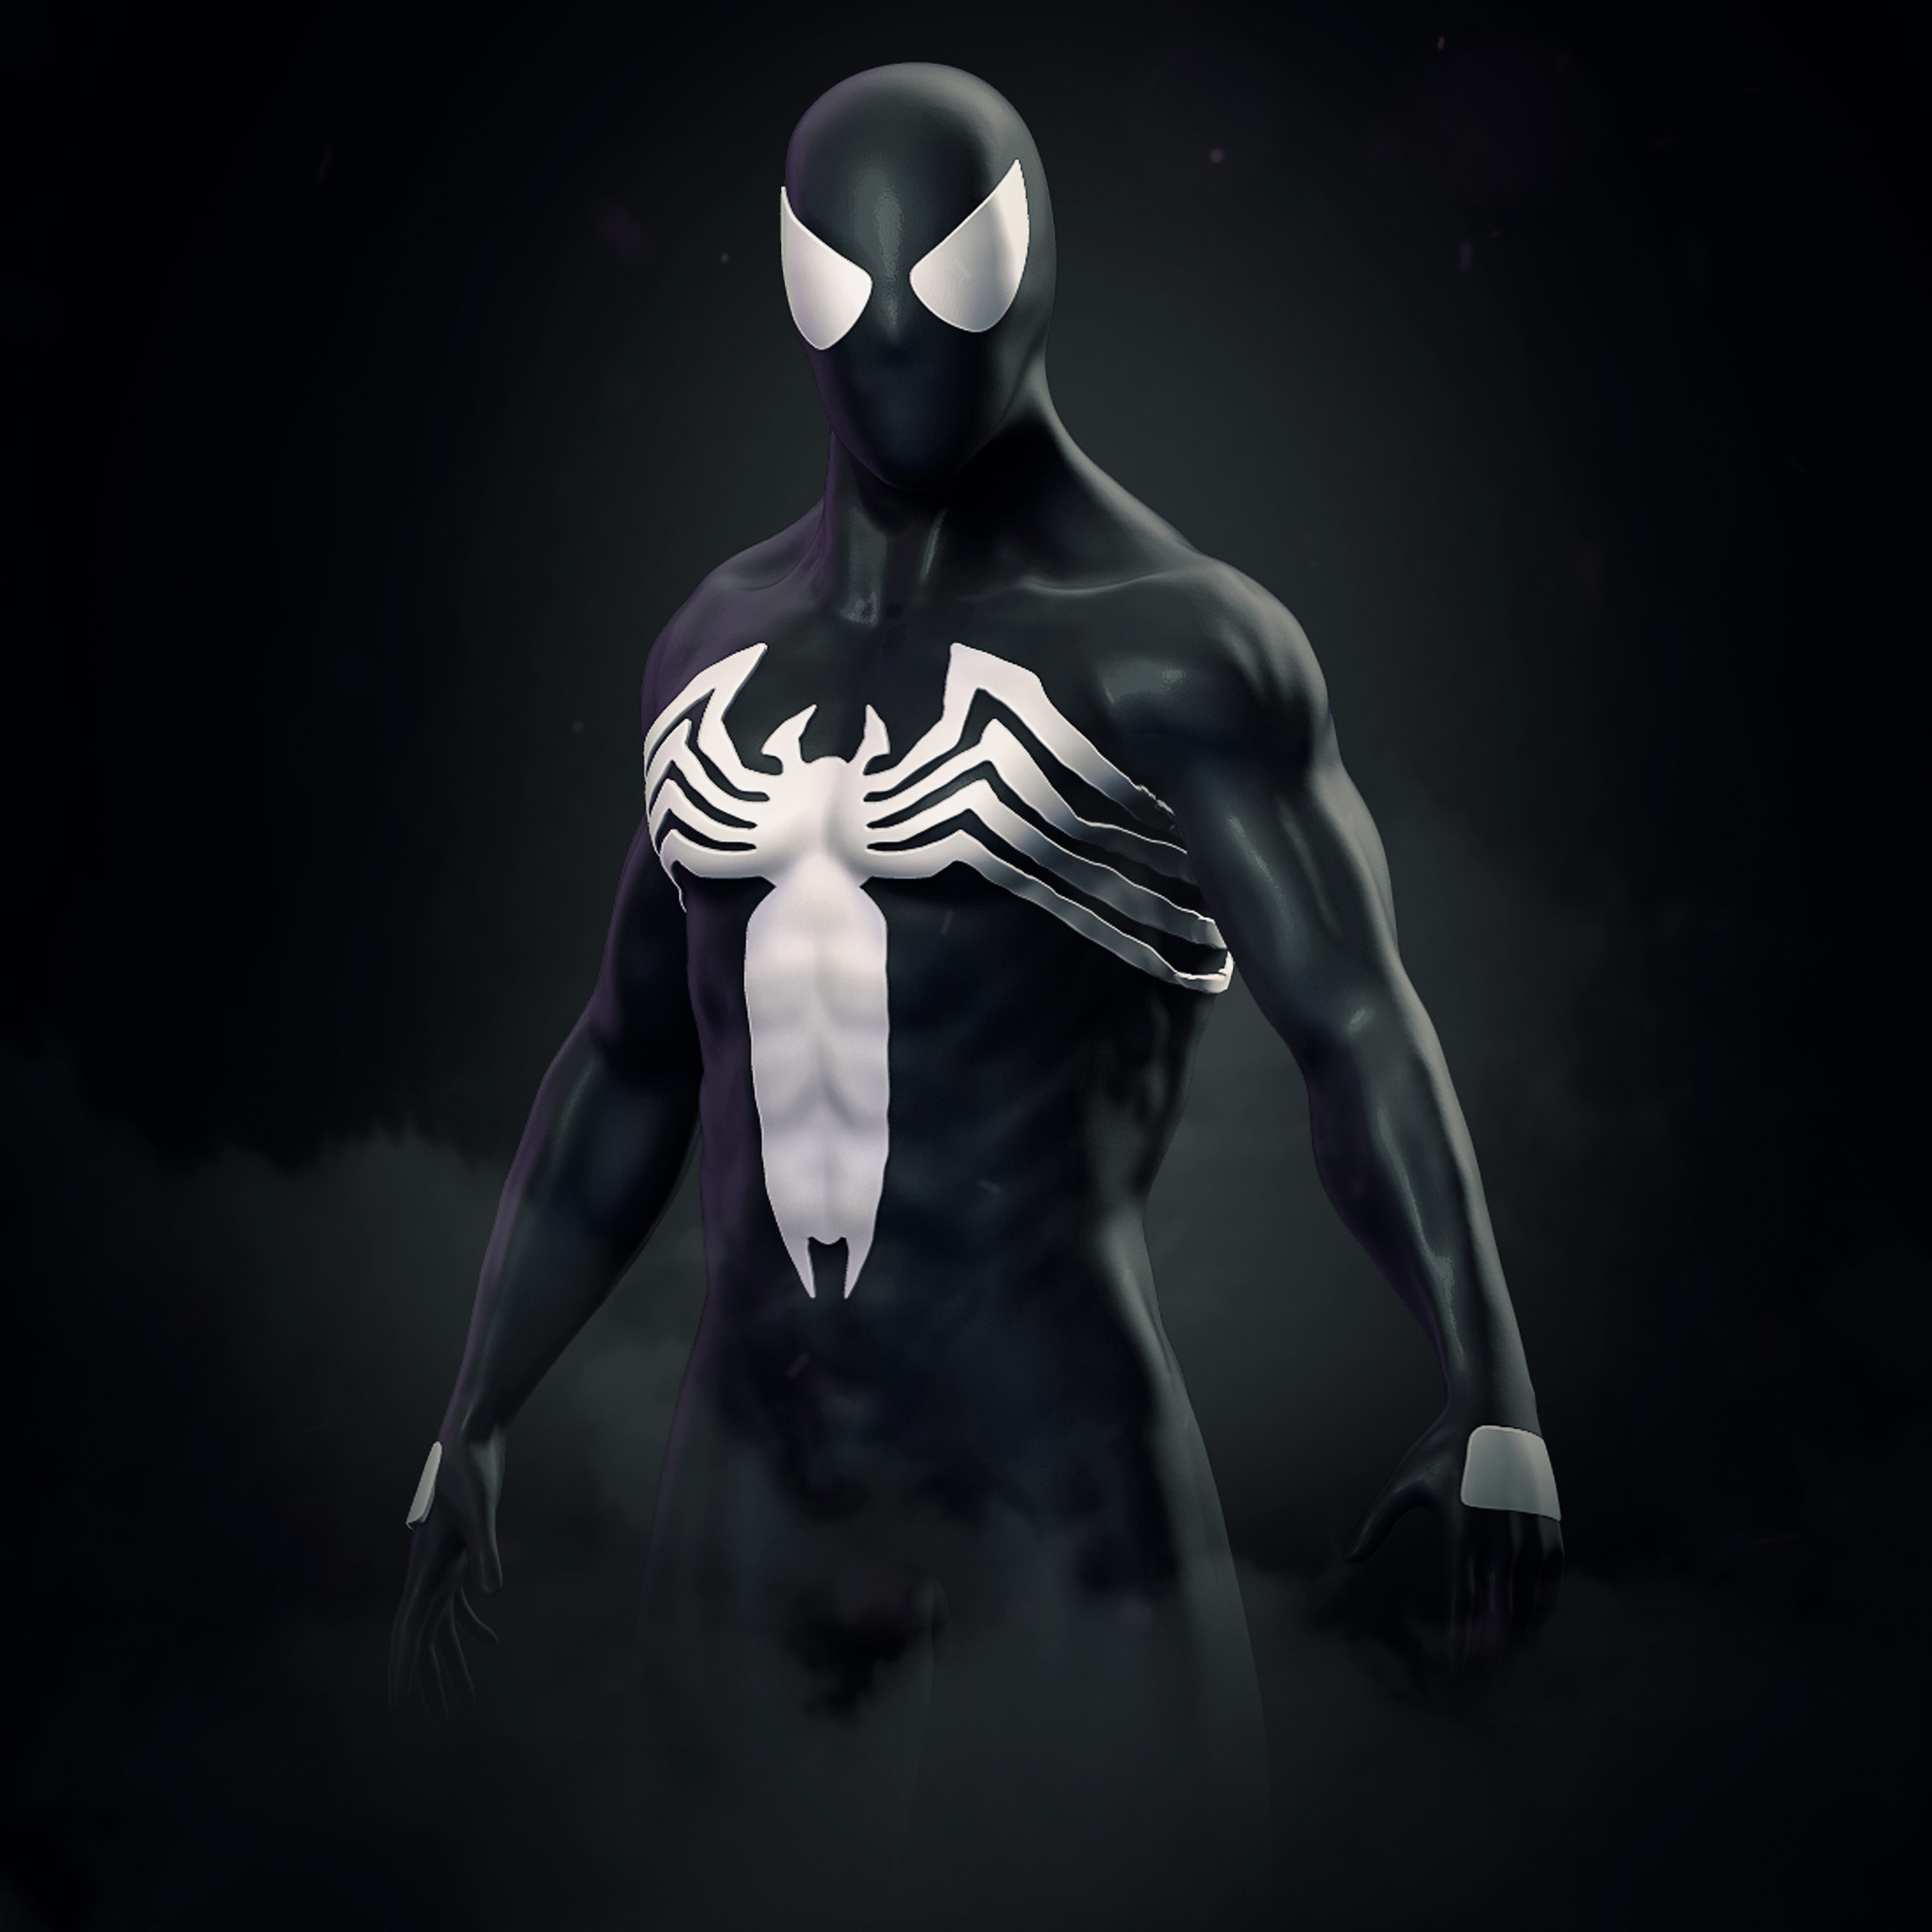 2048x2048 Amazing Spider Man Symbiote Suit Ipad Air HD 4k ...